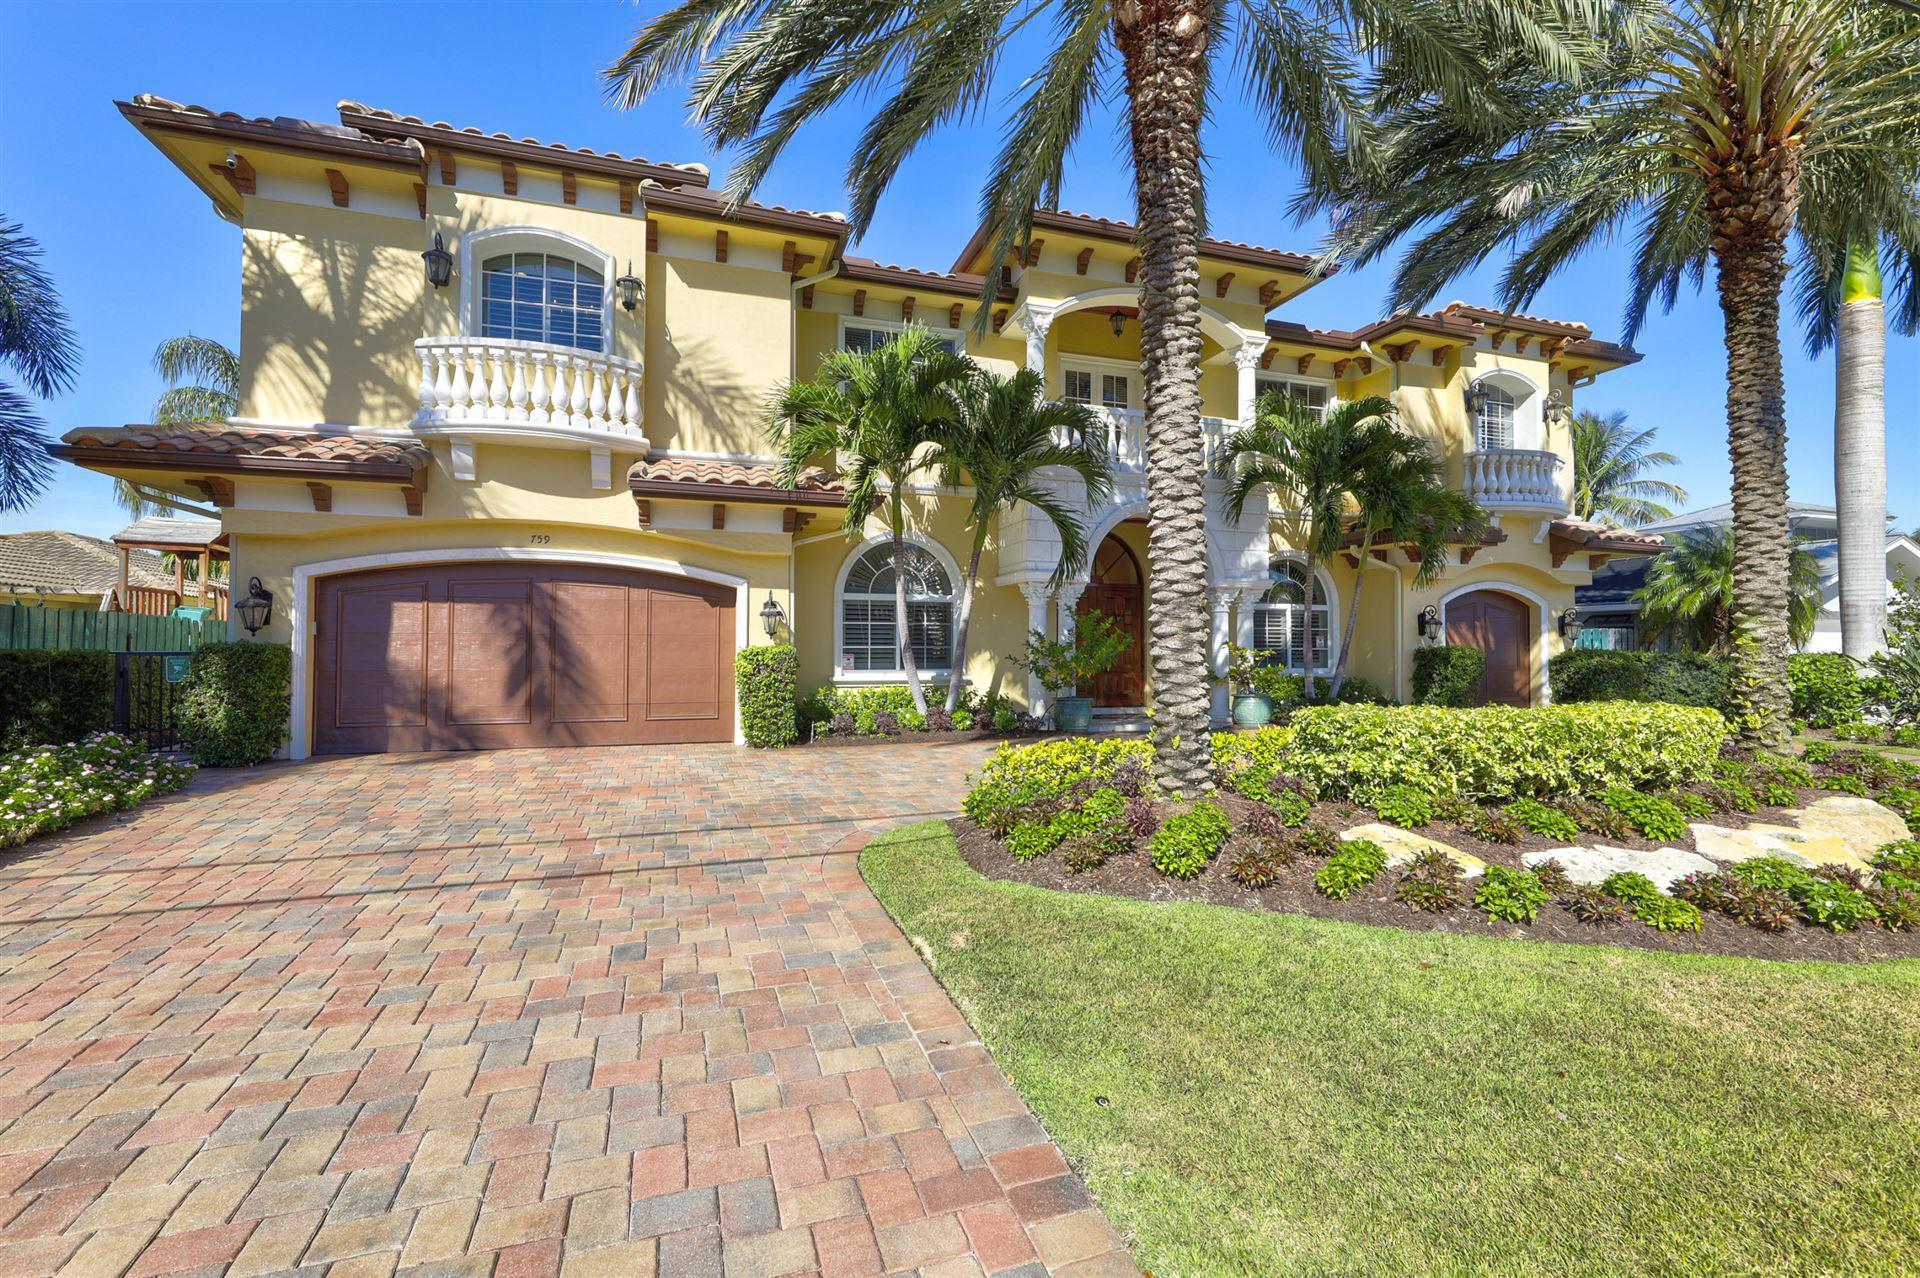 759 Glouchester Street, Boca Raton, FL 33487 - MLS#: RX-10598850